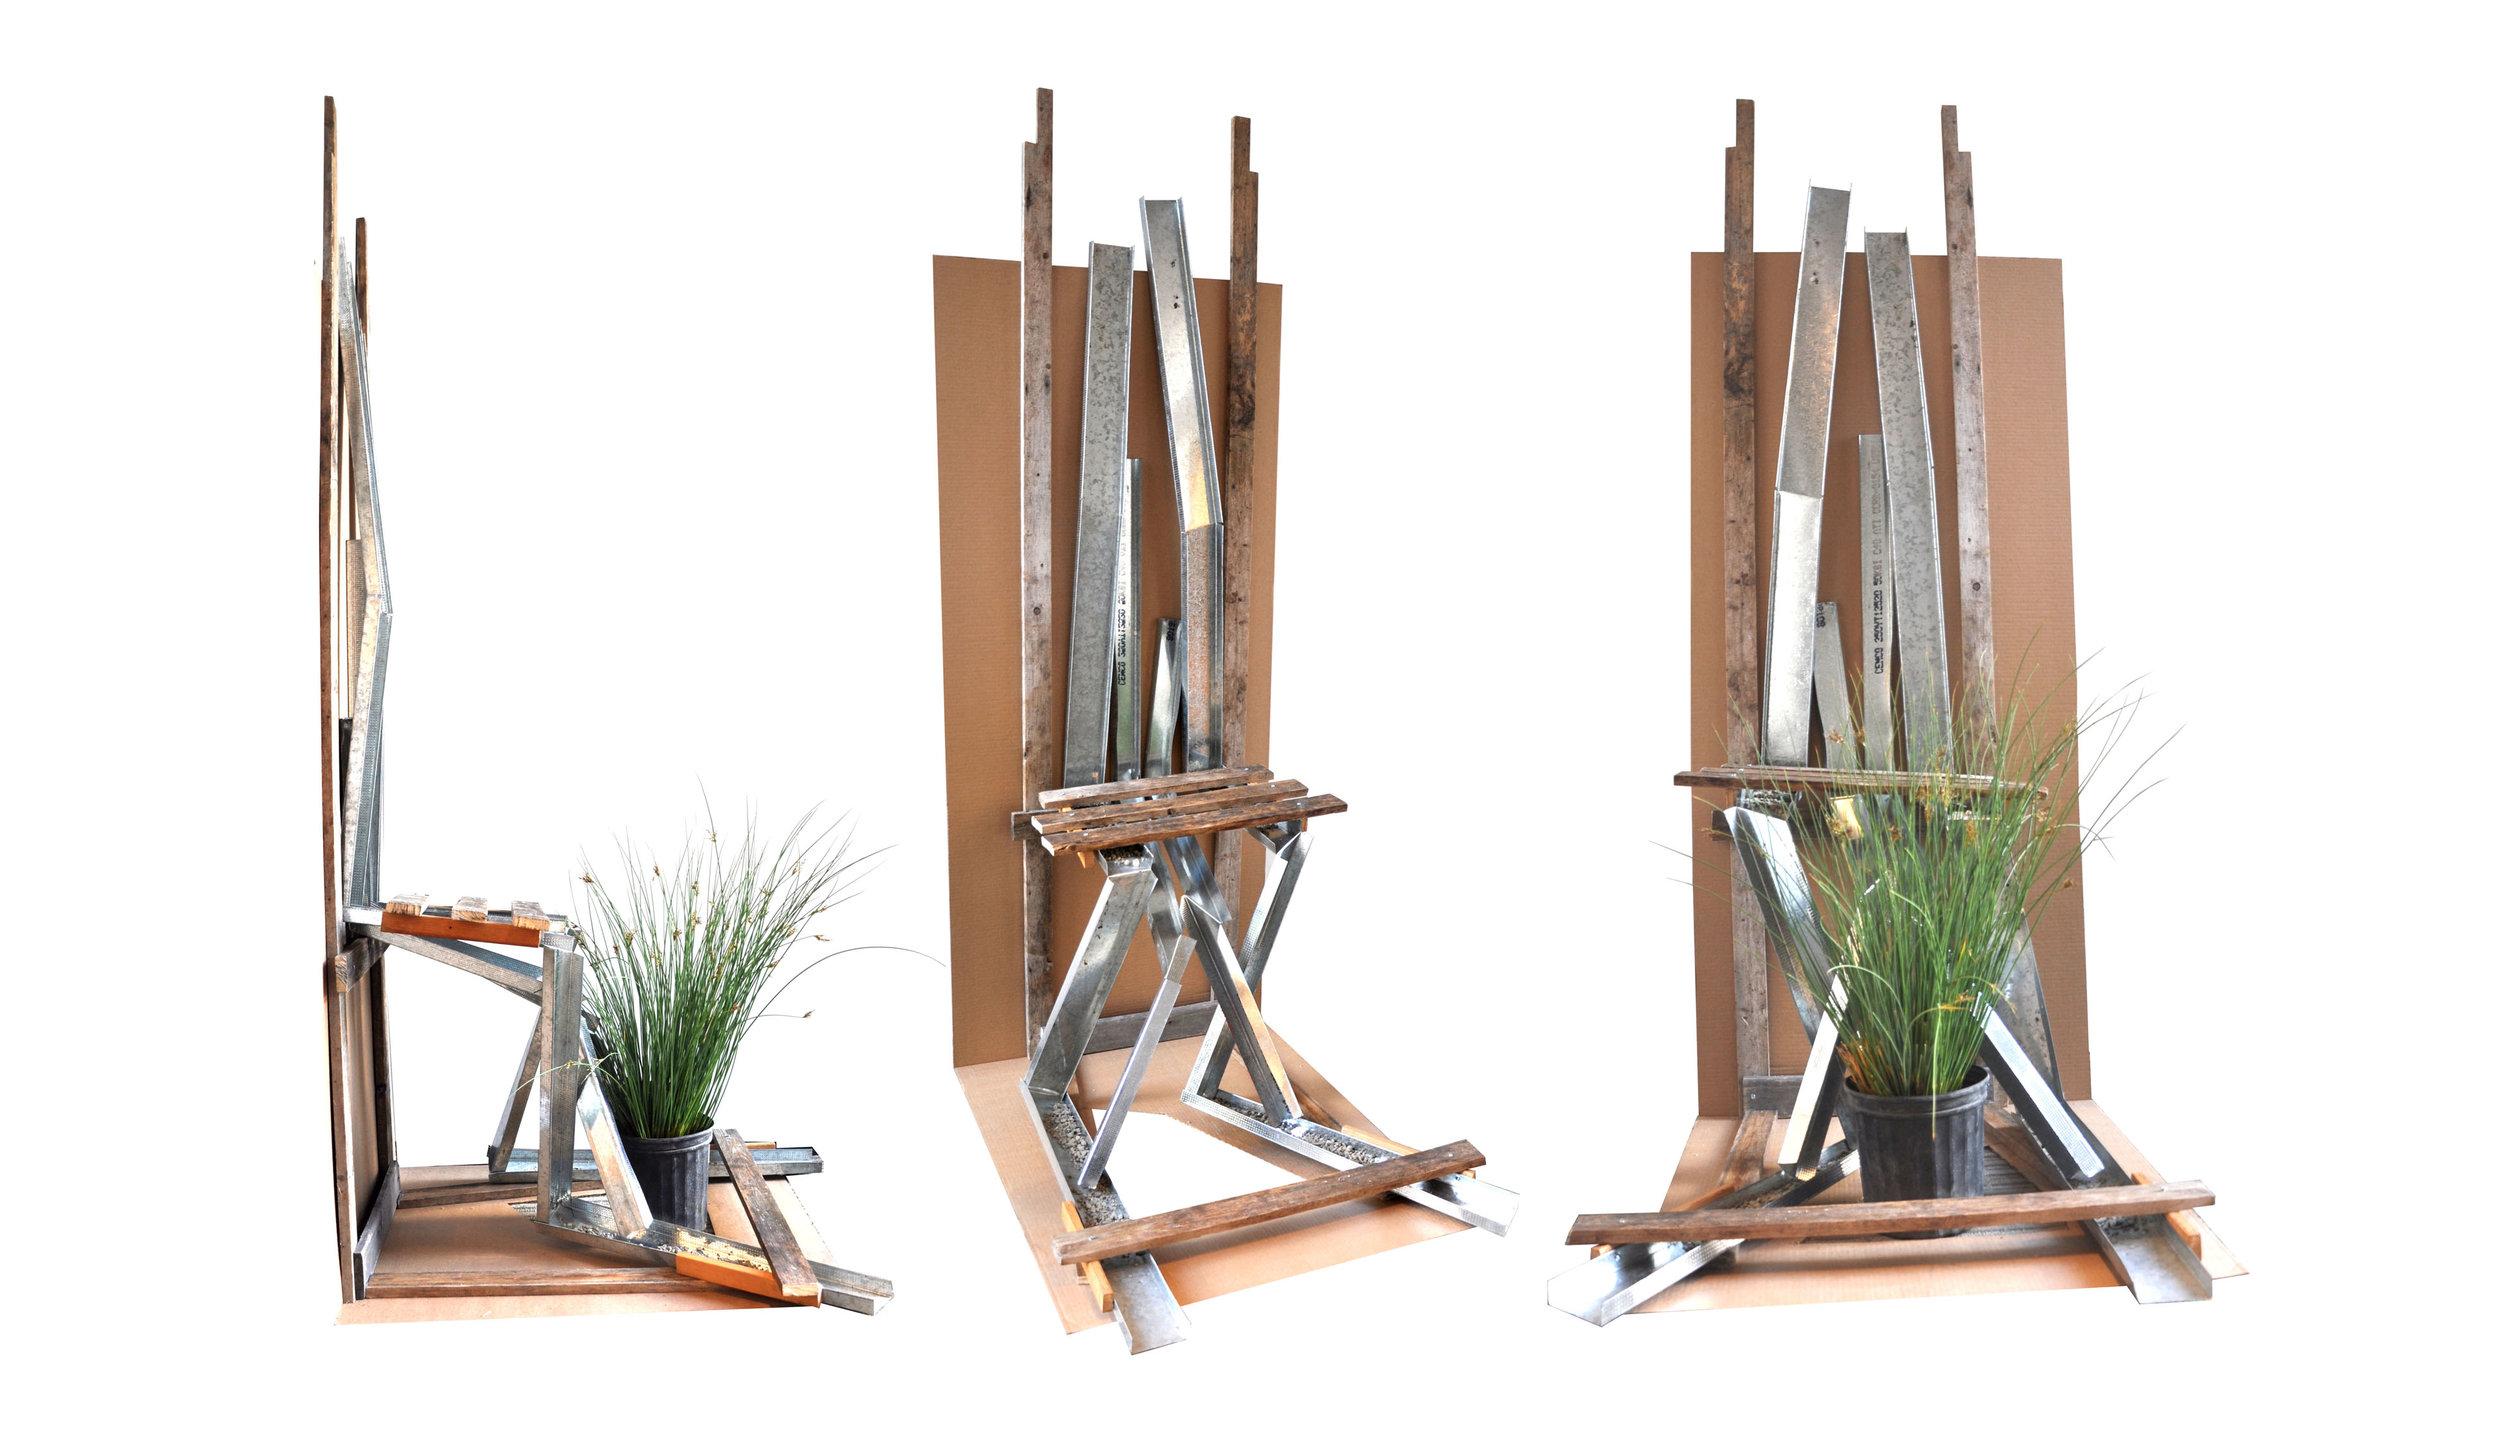 TINA CHEE_landscape studio_conveyance furniture6.jpg